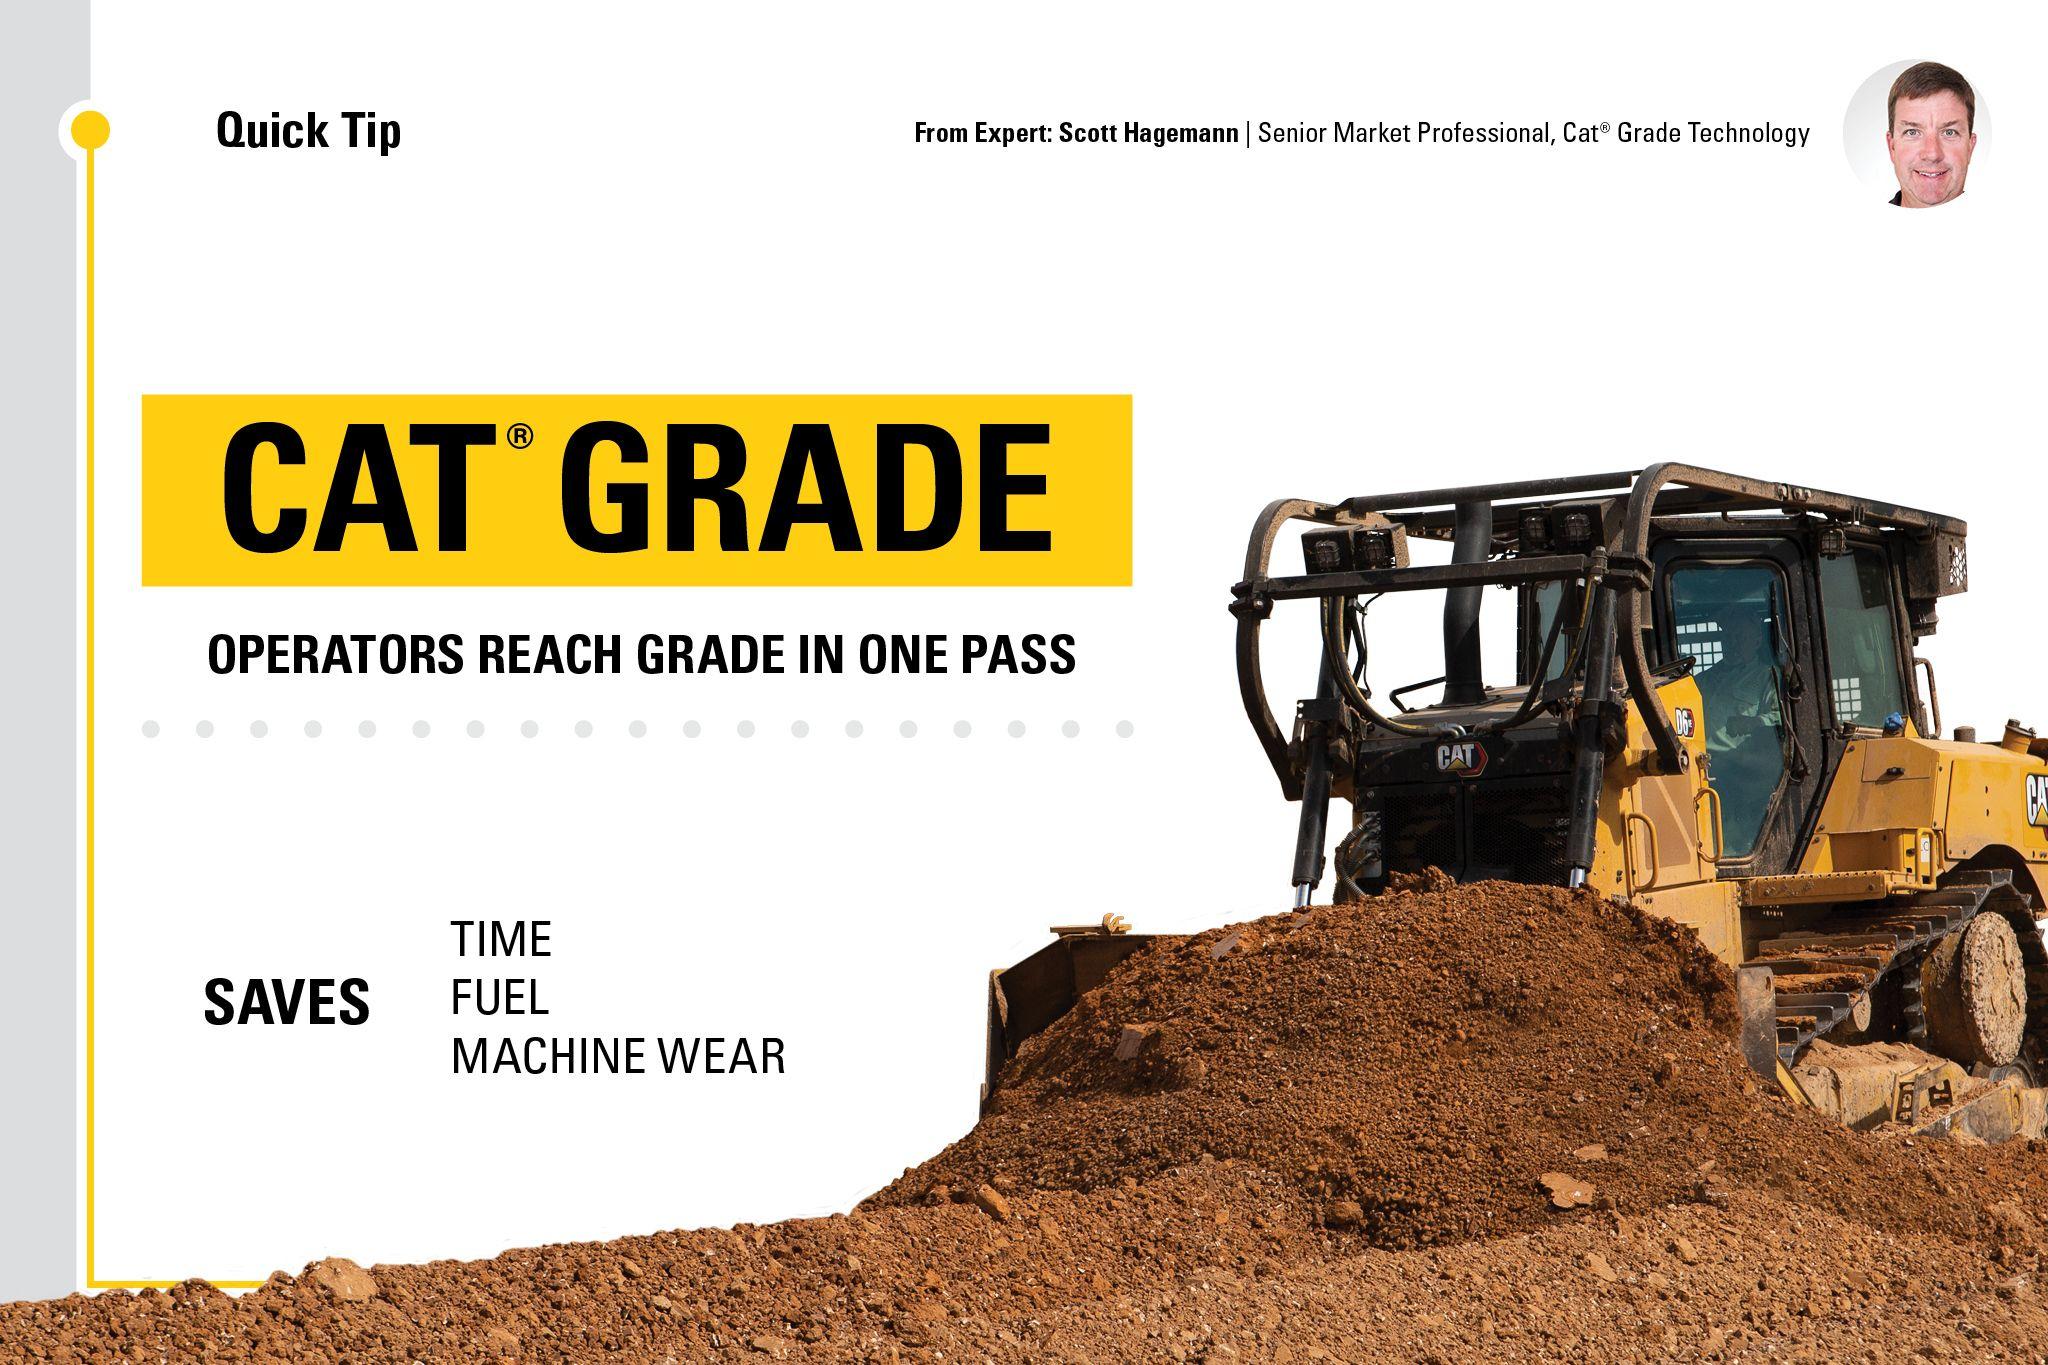 Cat® Grade: Operators reach grade in one pass.